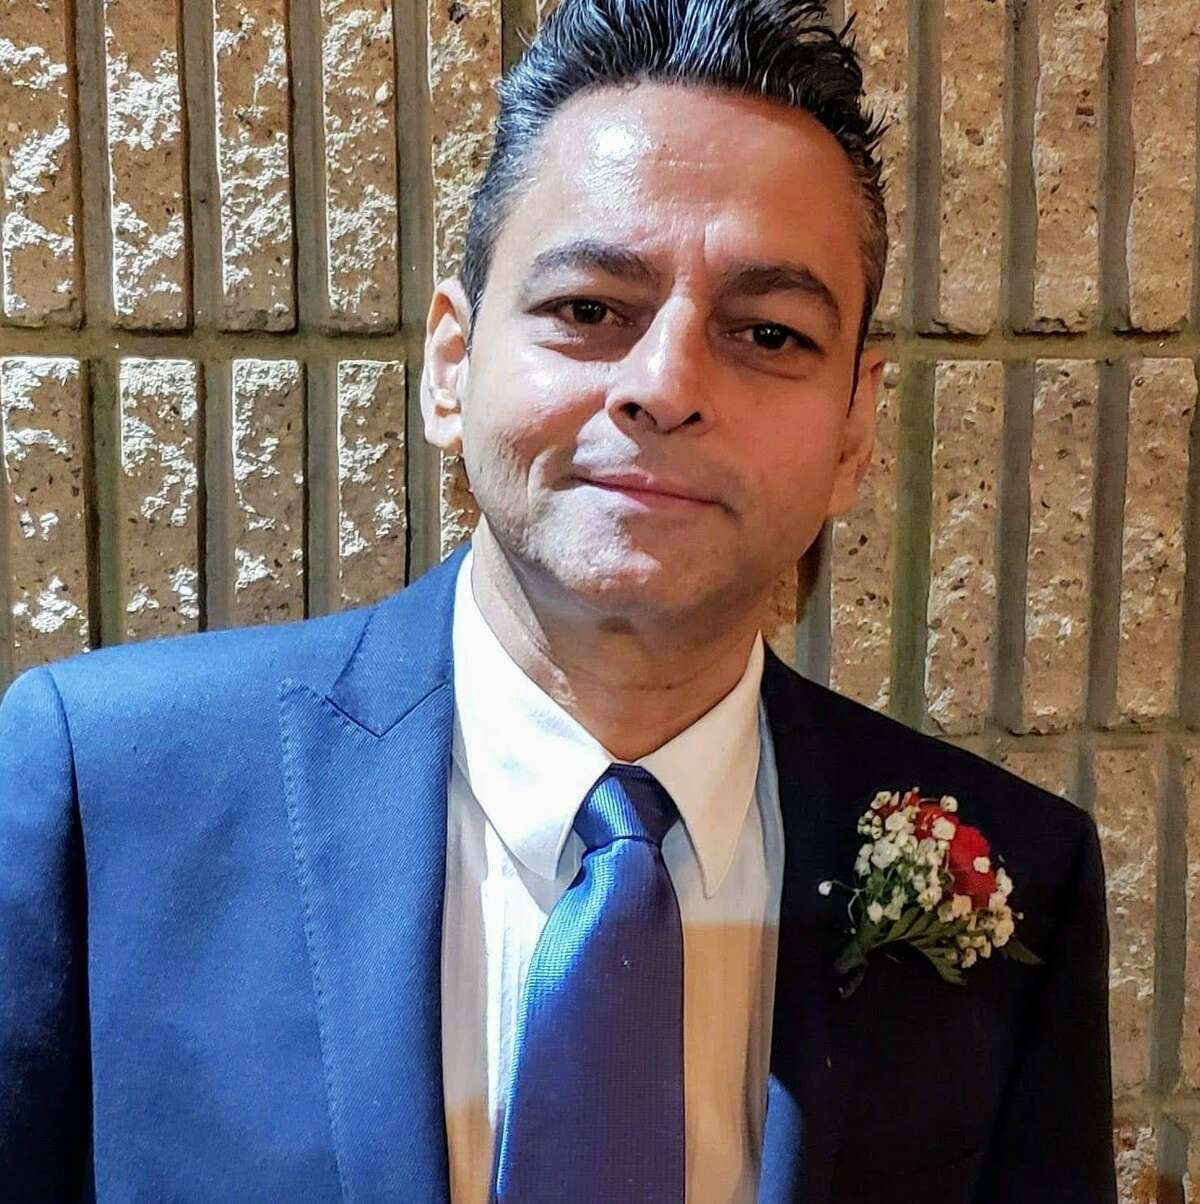 Board of Aldermen member David Gidwani